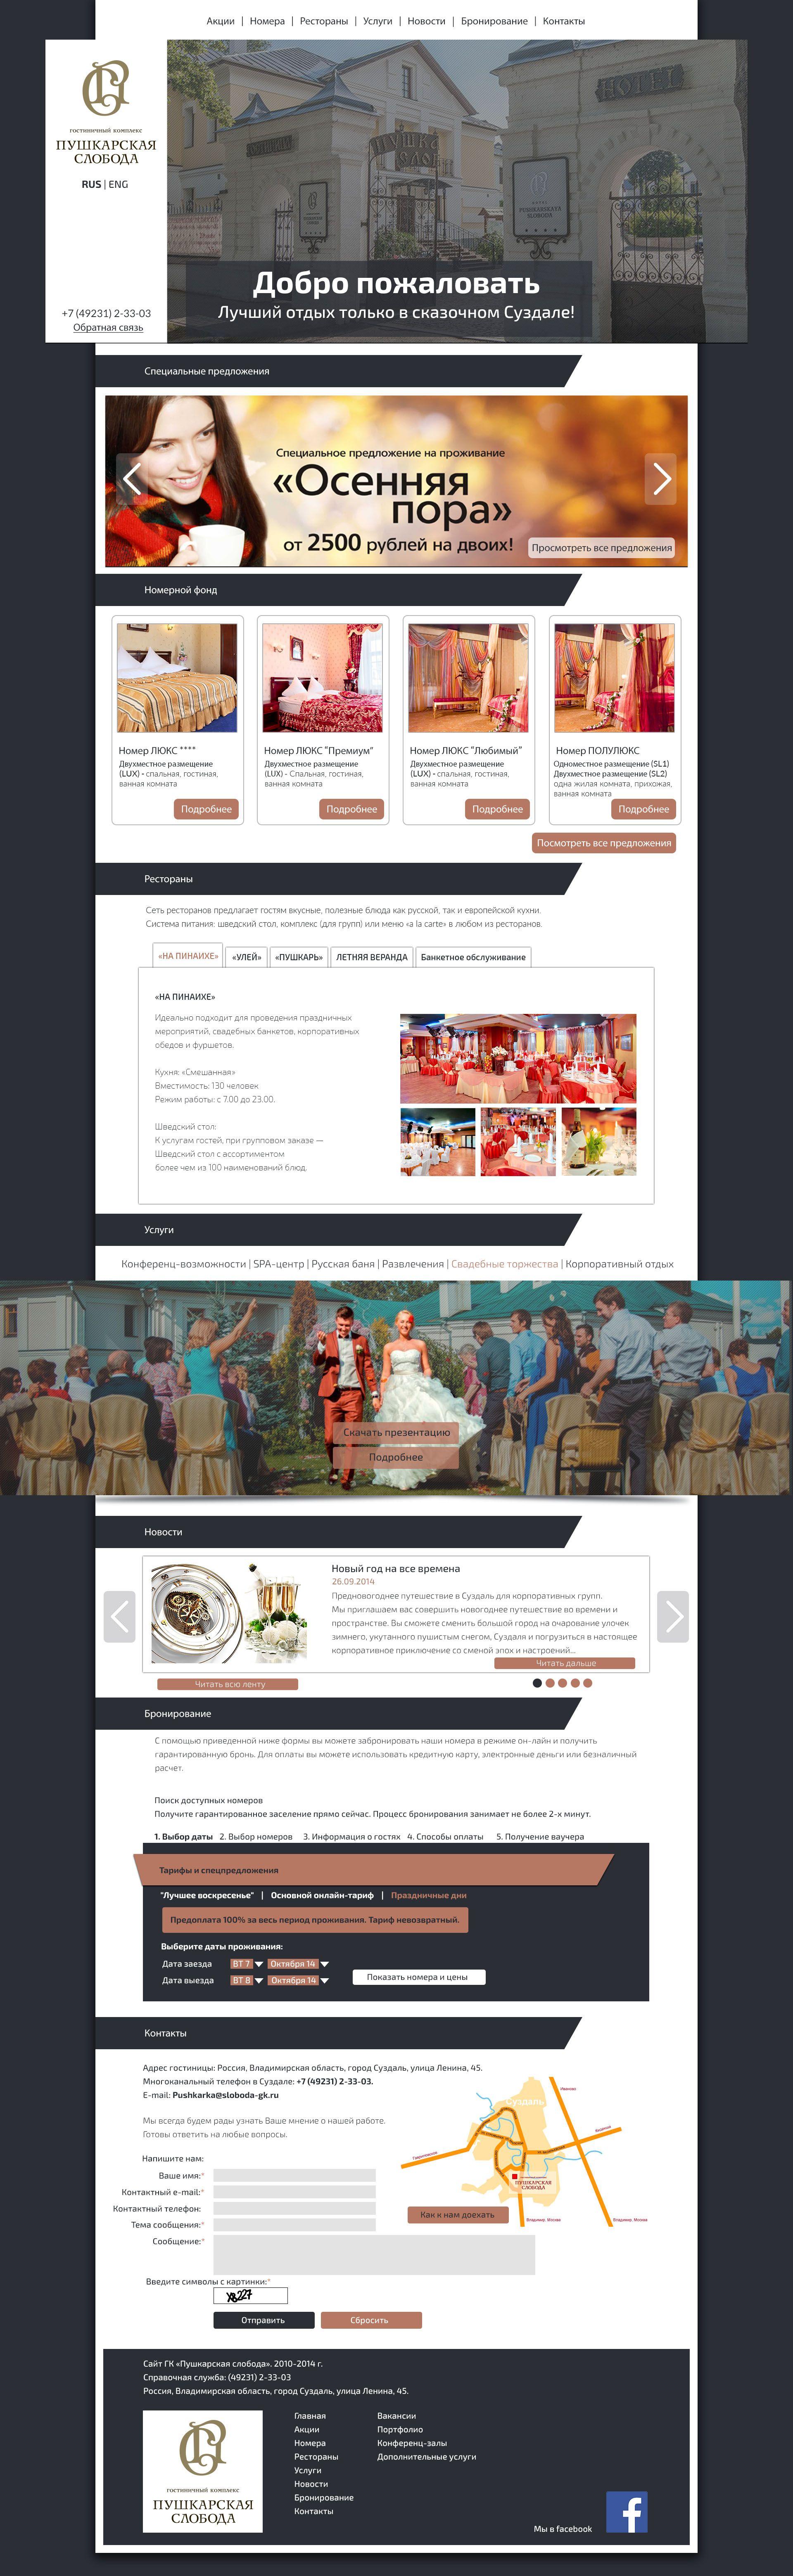 Сайт Пушкарской Слободы - дизайнер Kanzai